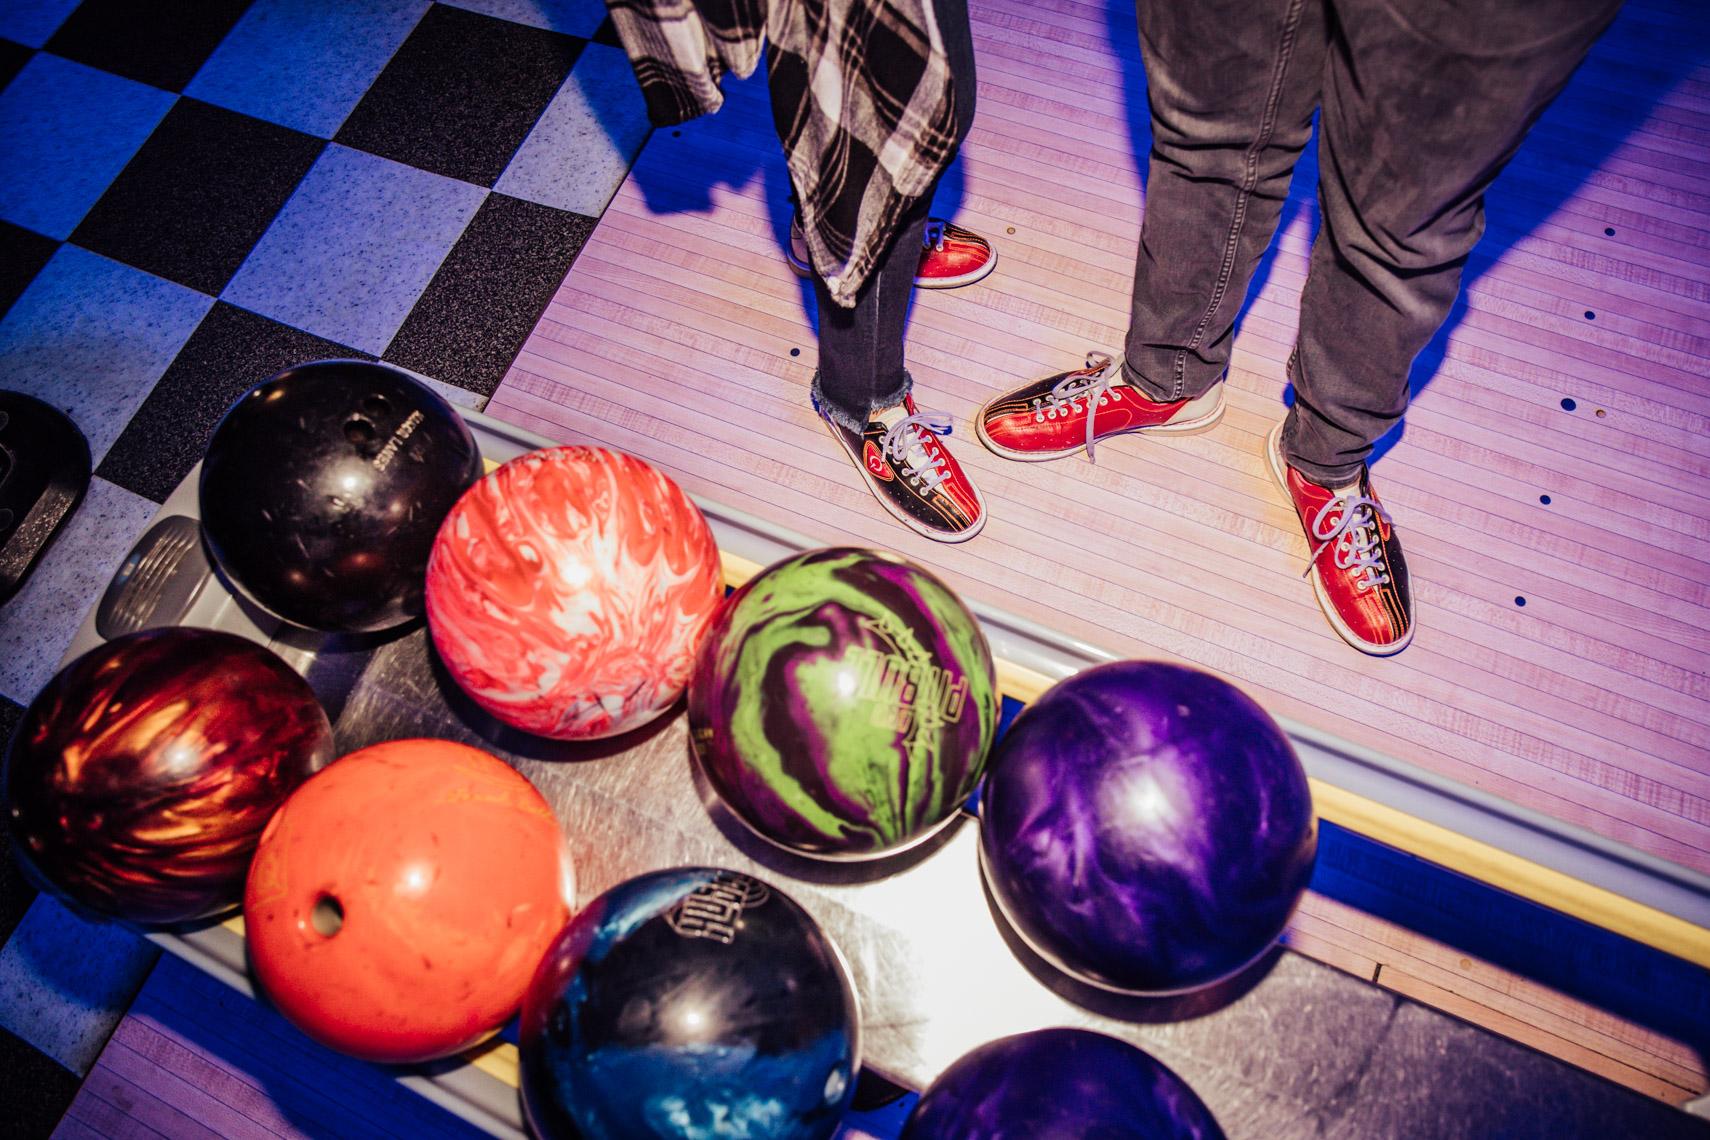 BowlingParty_3_22_19_060.jpg